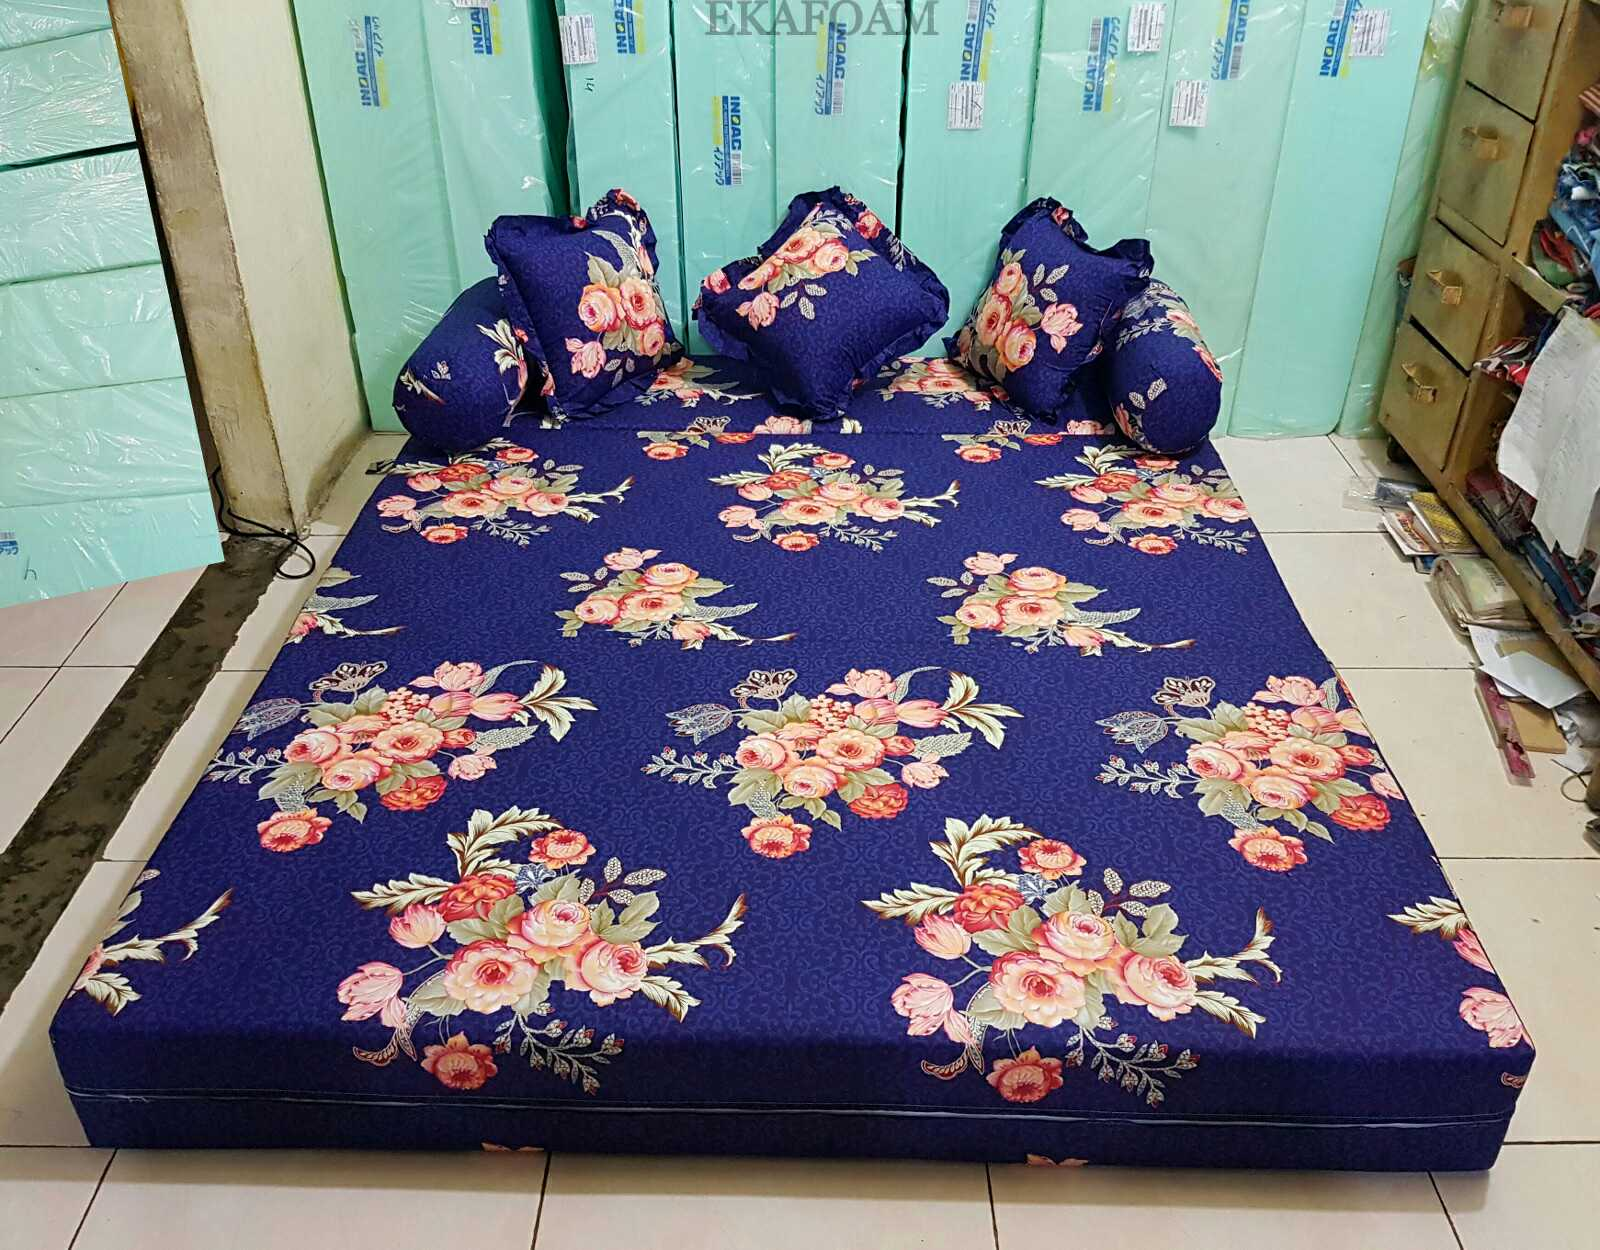 Sofa Bed Inoac 3 In 1 2 Seater Beds 2018 Full Motif Agen Resmi Kasur Busa